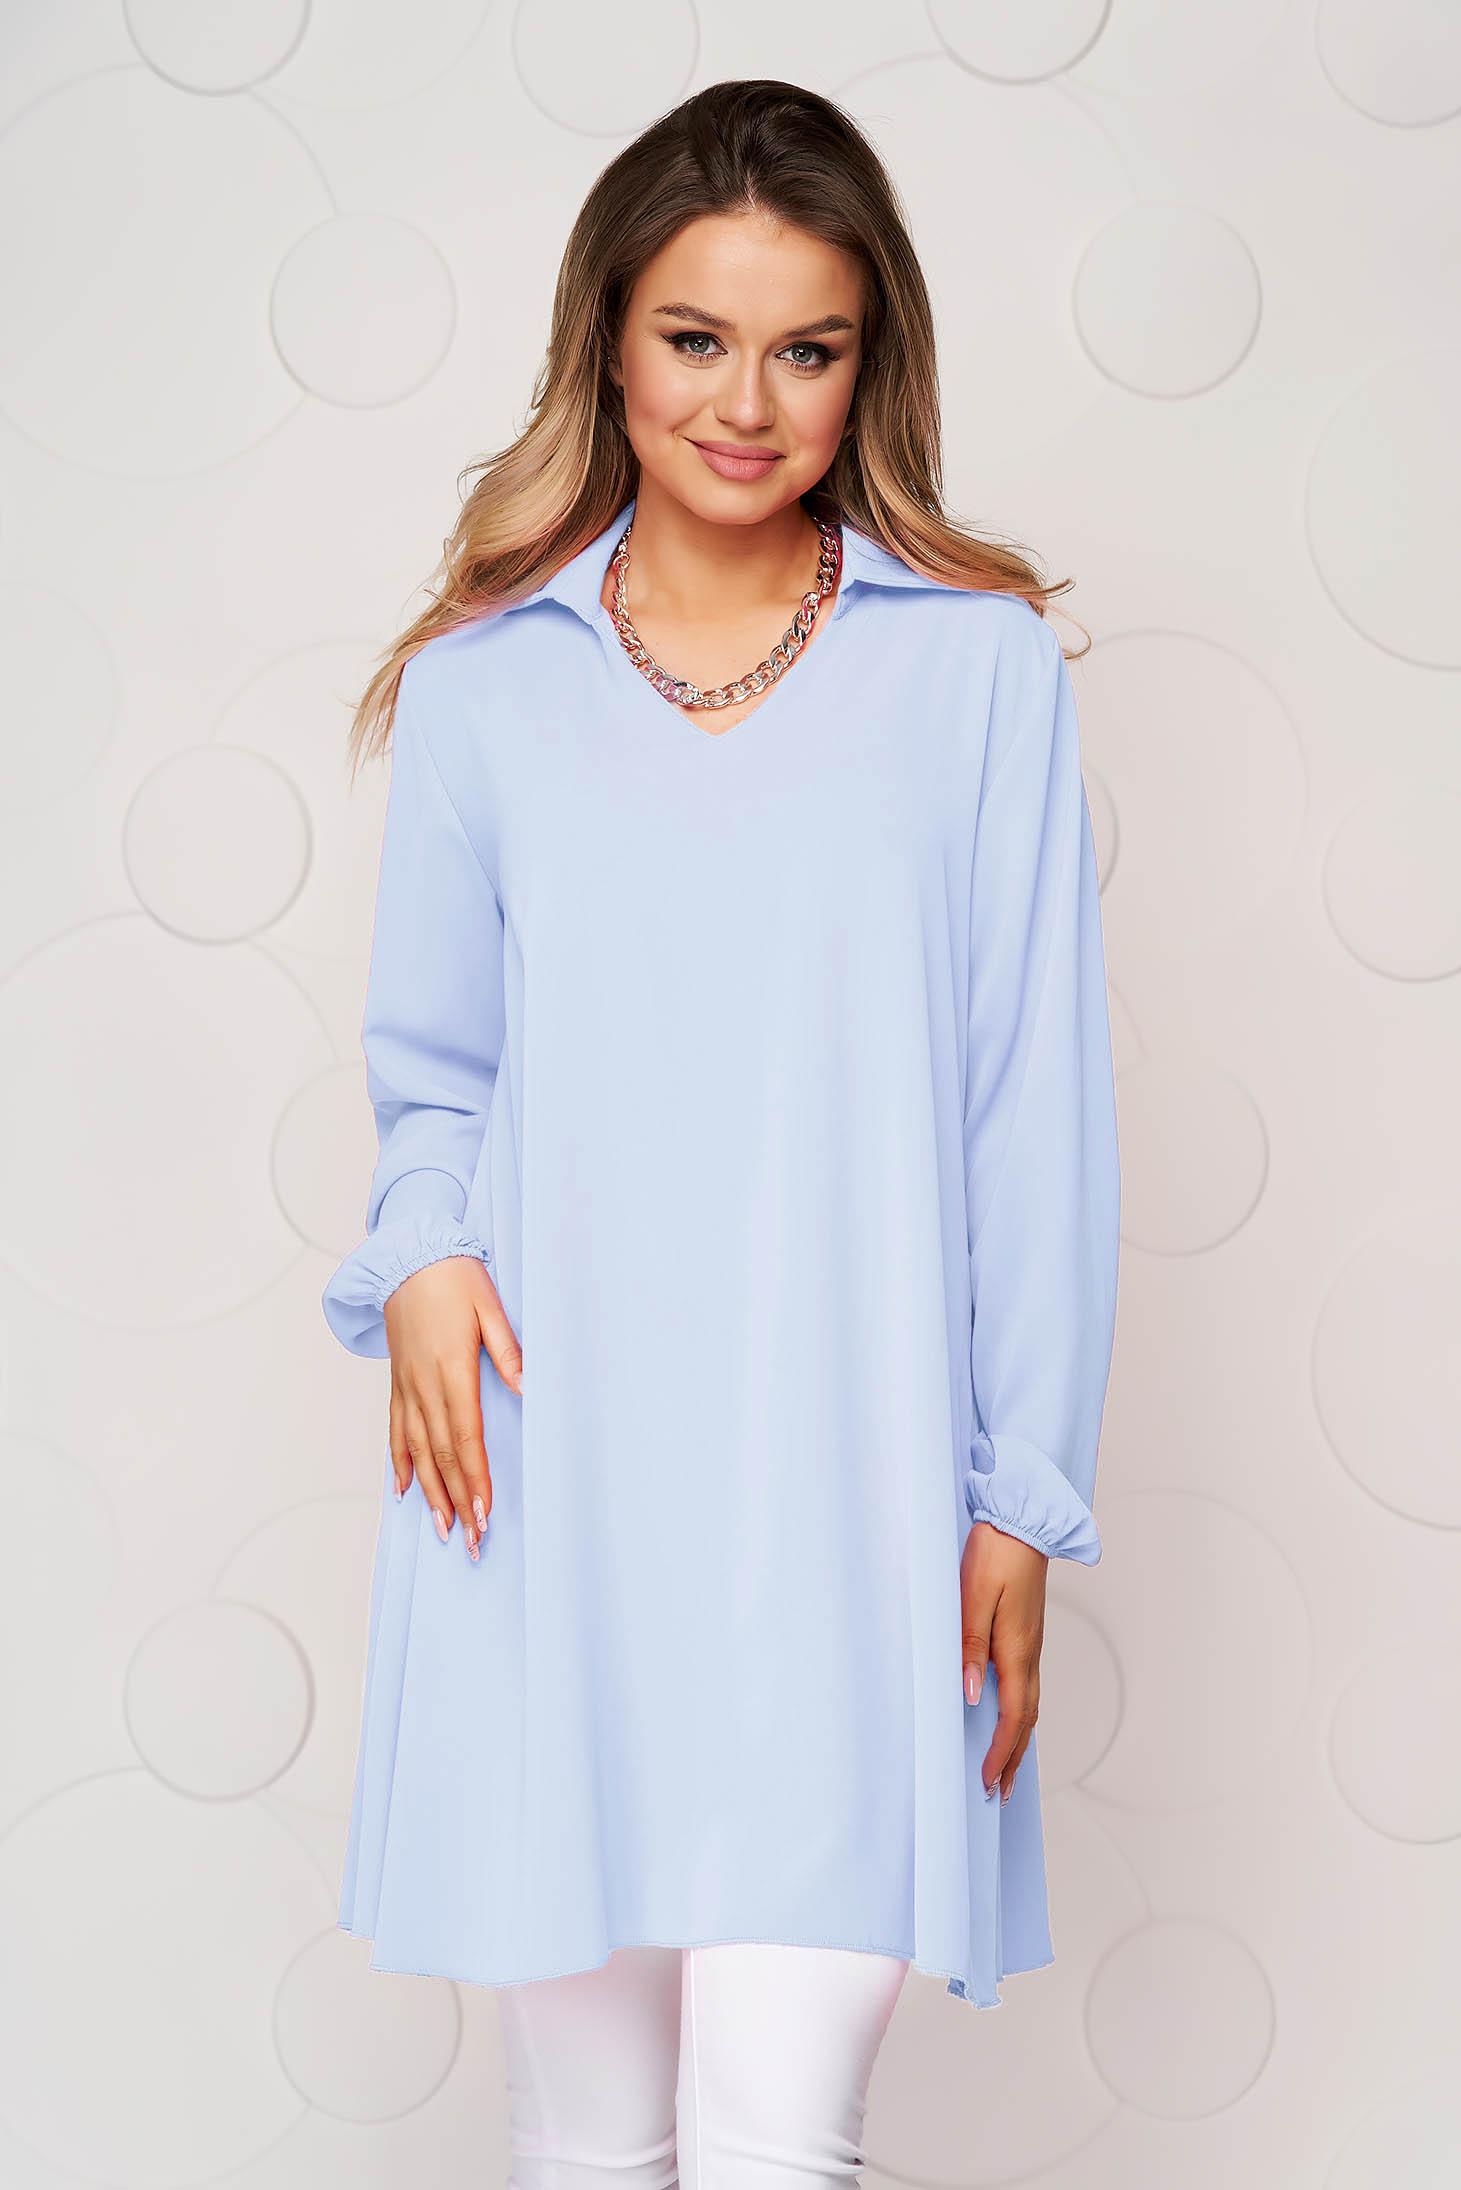 Bluza dama SunShine albastra cu croi larg din material vaporos si transparent cu maneca lunga